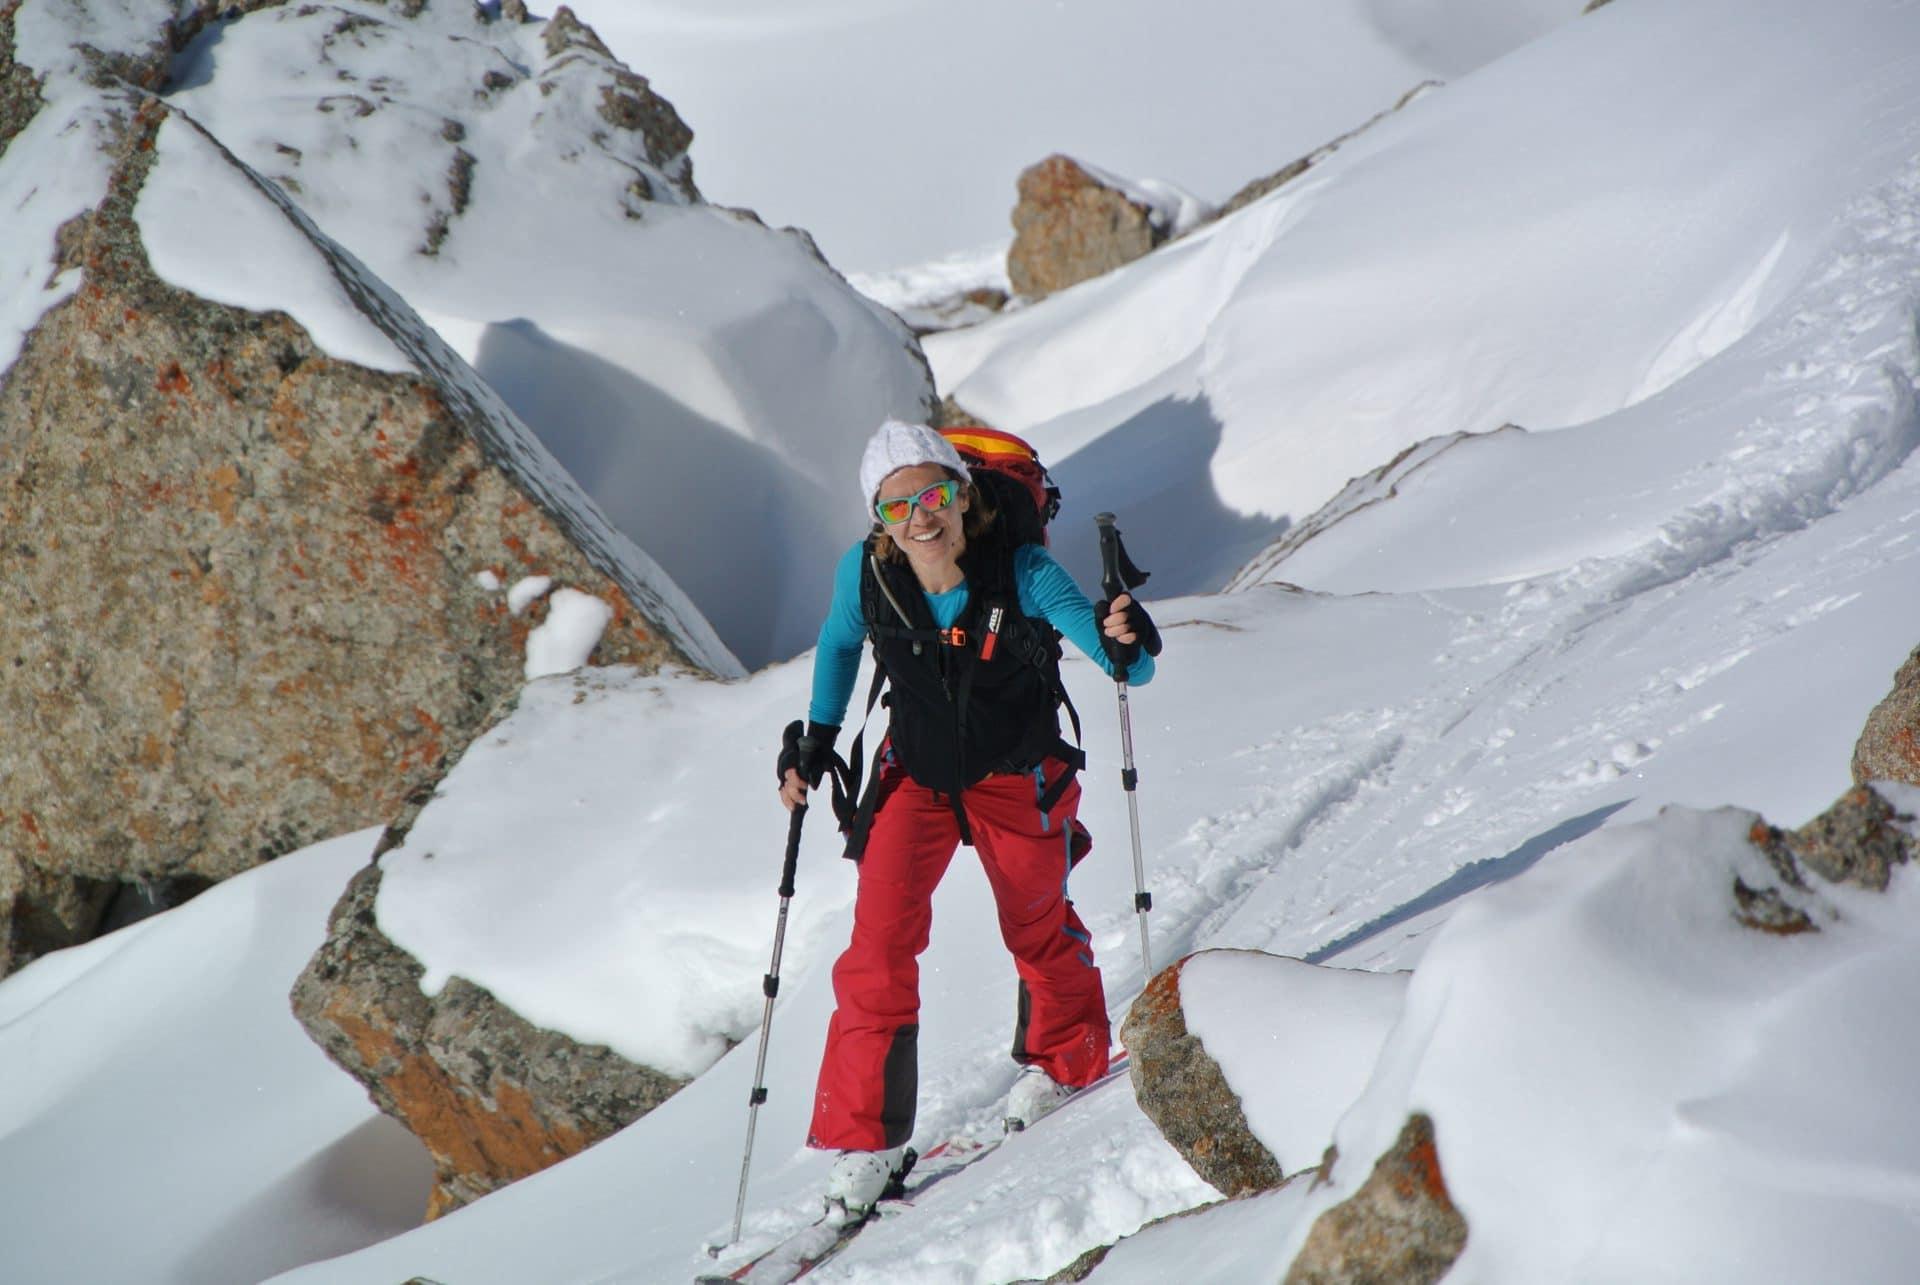 Helyum_Xavier-Carrard_Guide-de-montagne_Ski_Voyage_Kirghistan_Asie-Centrale_Face-sud_Julie_Radys